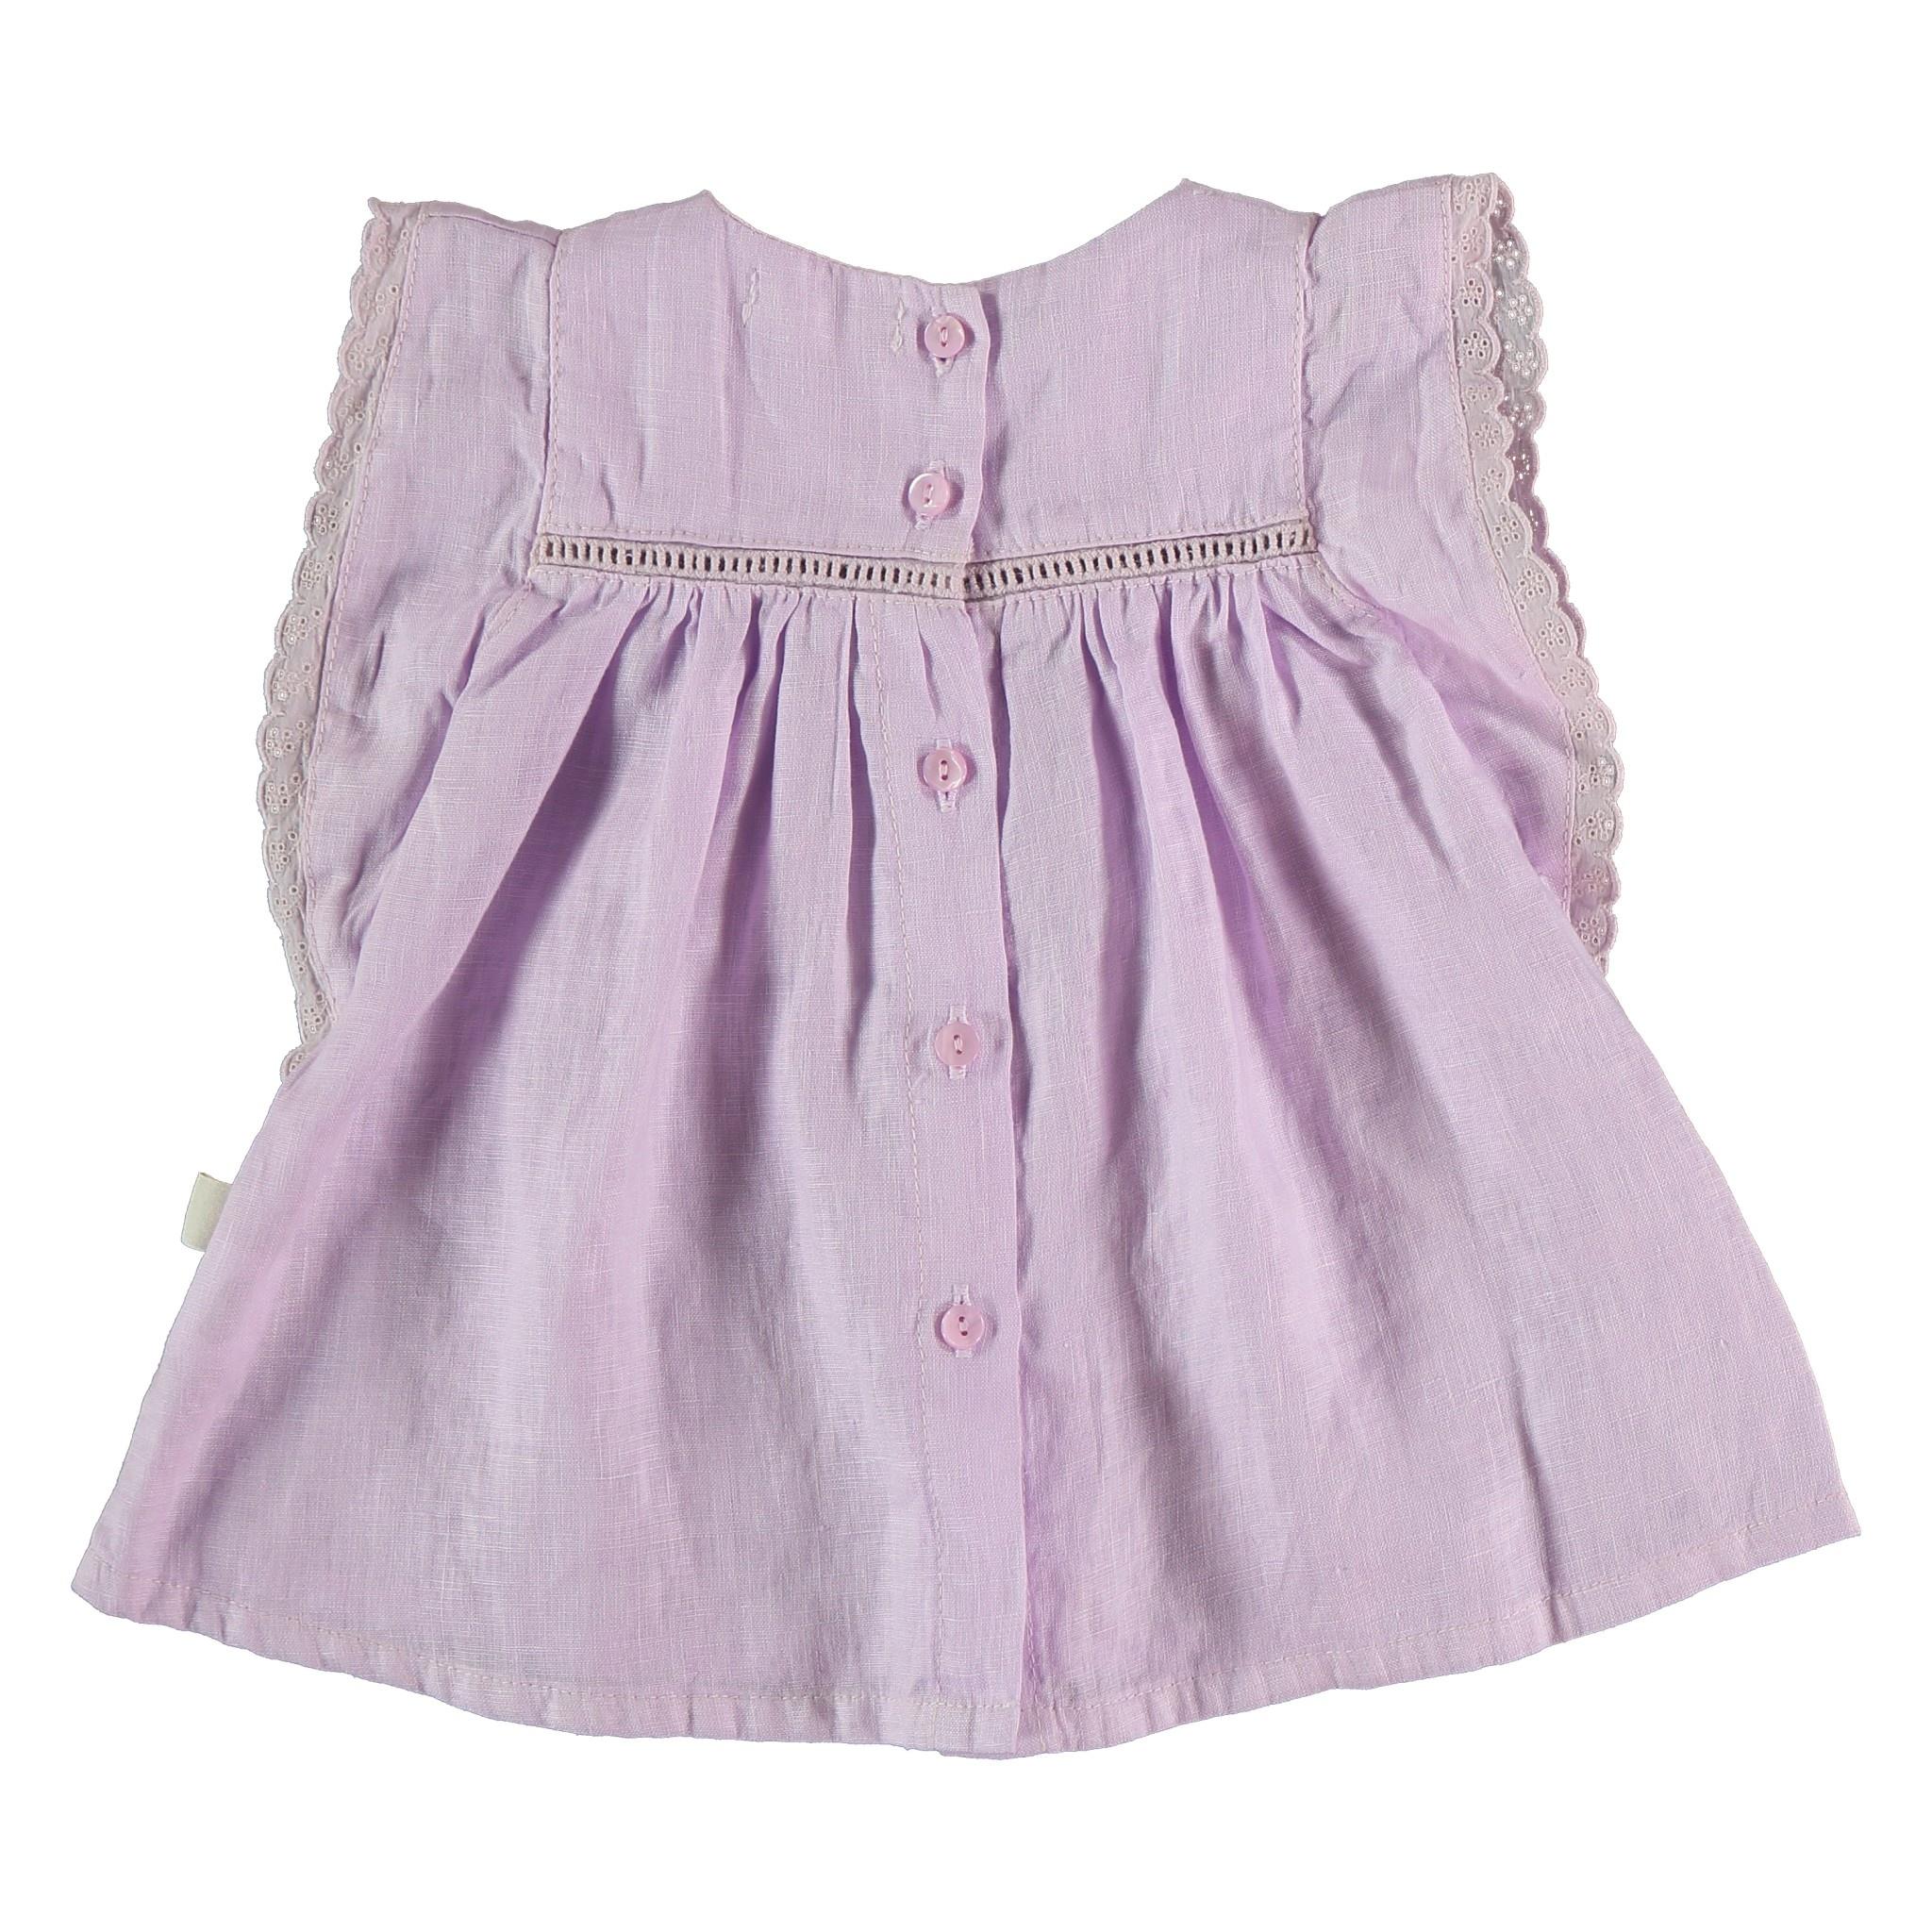 Novah linen dress mauve-2